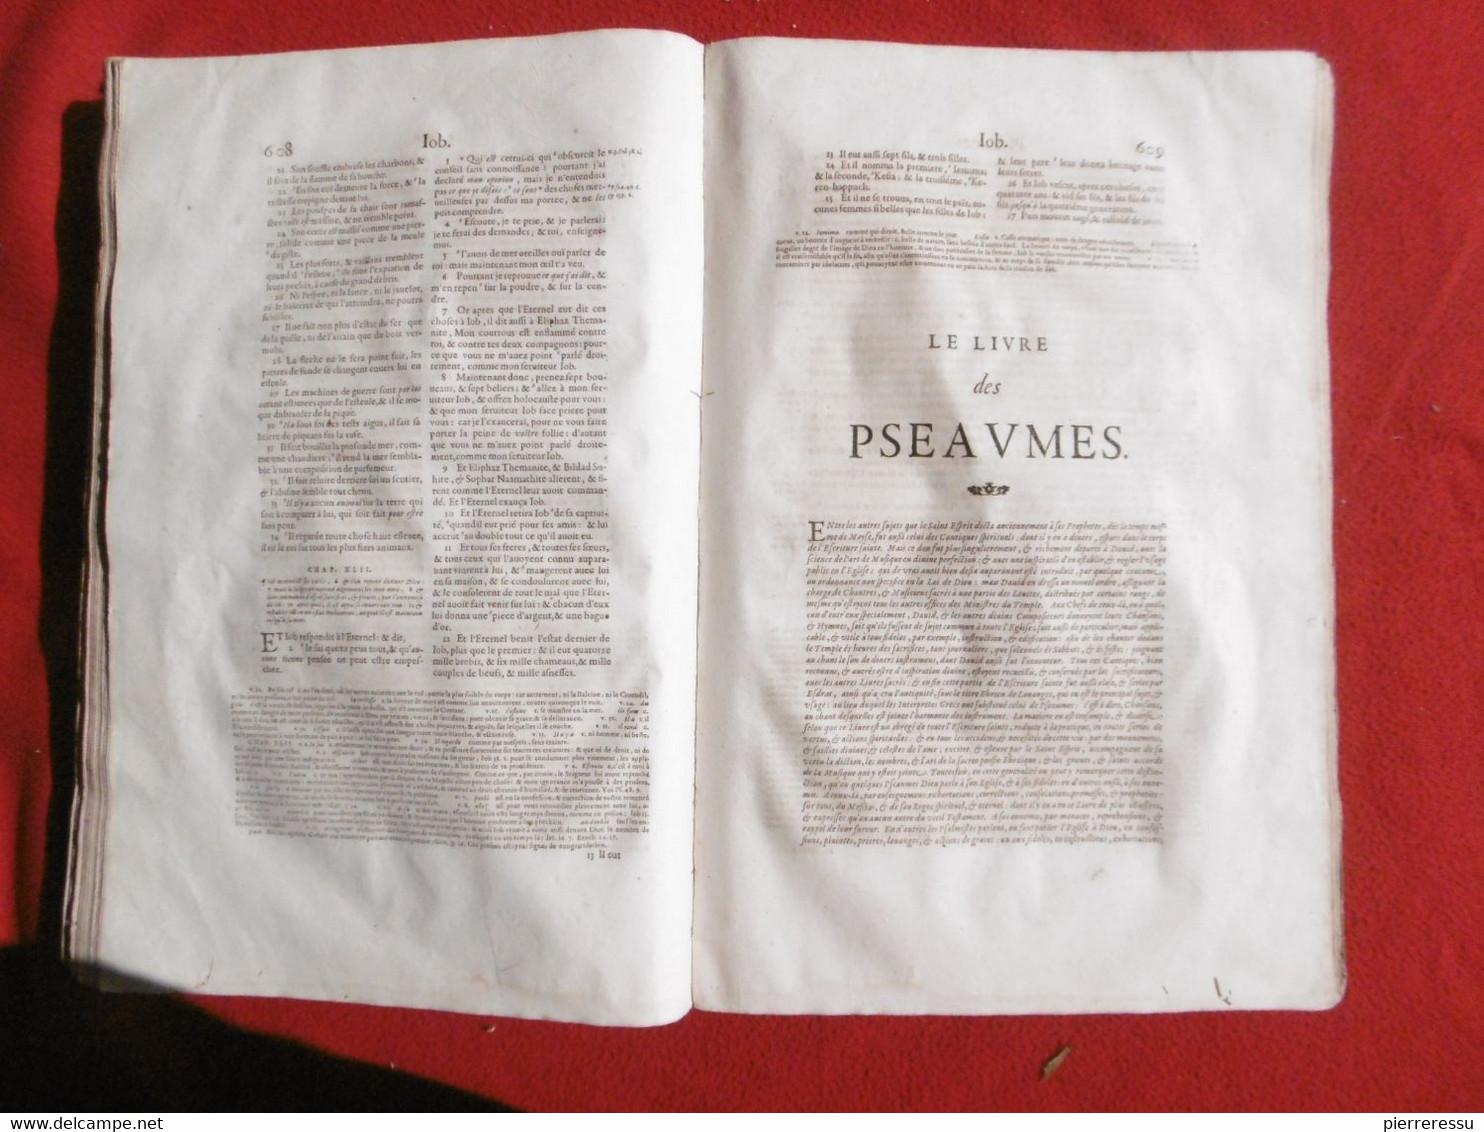 LA SAINTE BIBLE INTERPRETEE PAR JEAN DIODATI 1644 GENEVE PIERRE CHOUET RRRRRRRRRRRR - Christianity, Bibles